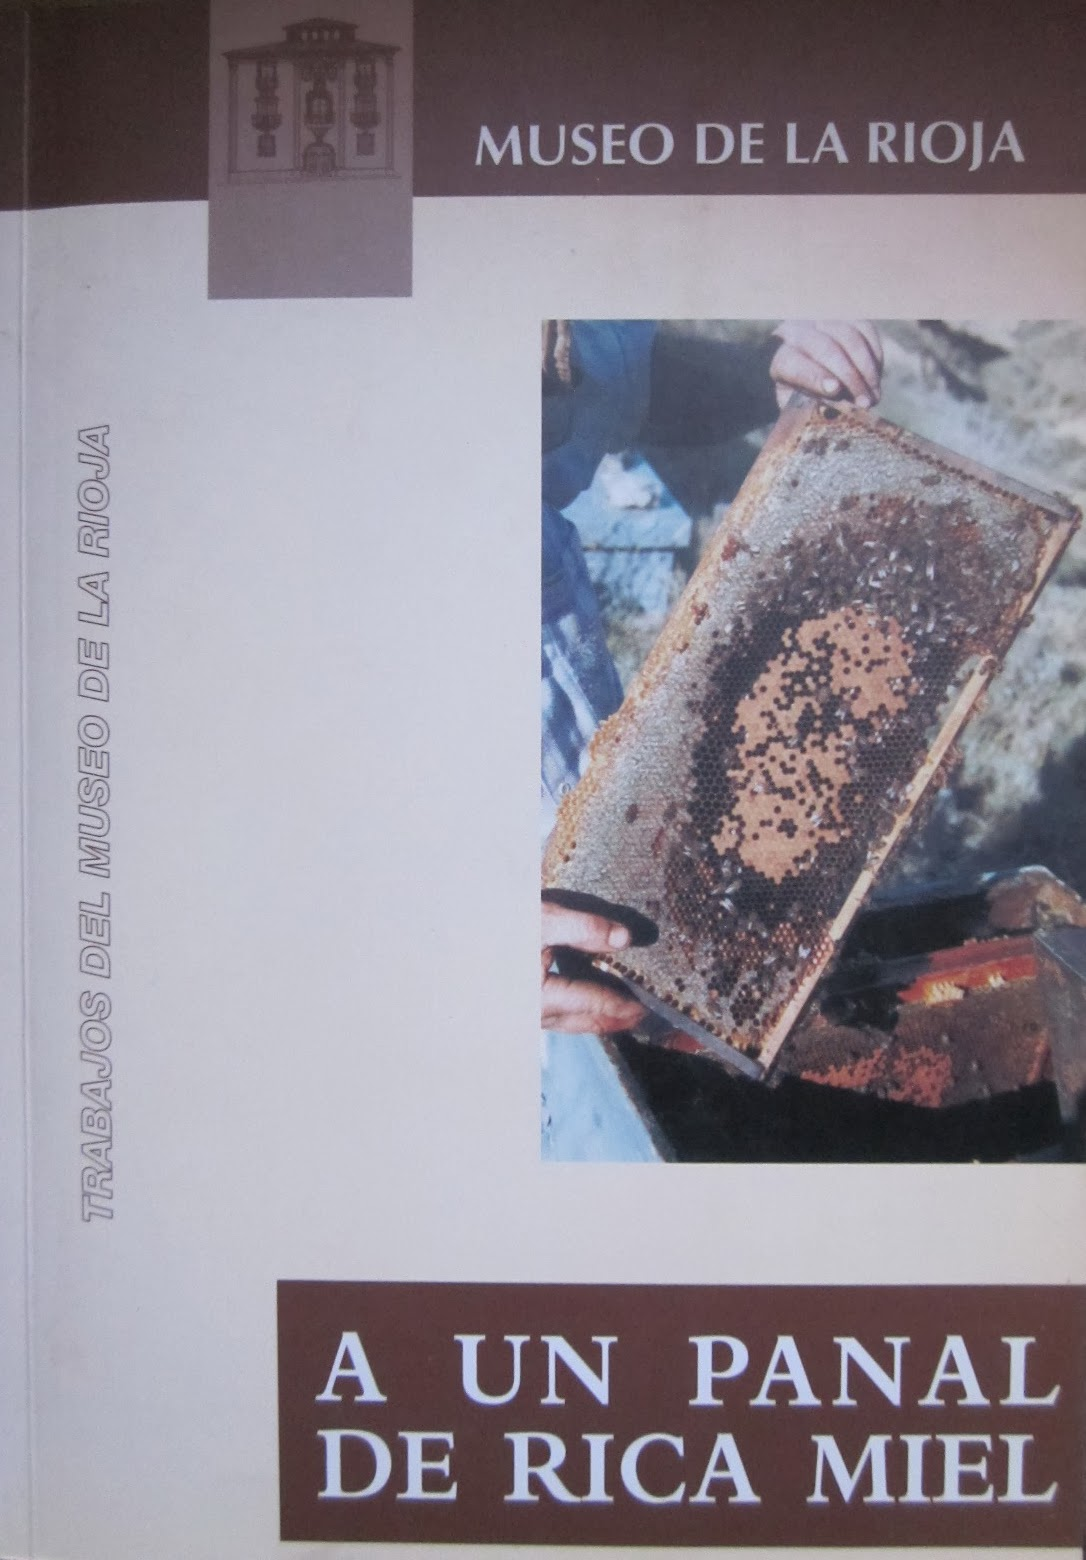 VV.AA., A un panal de rica miel